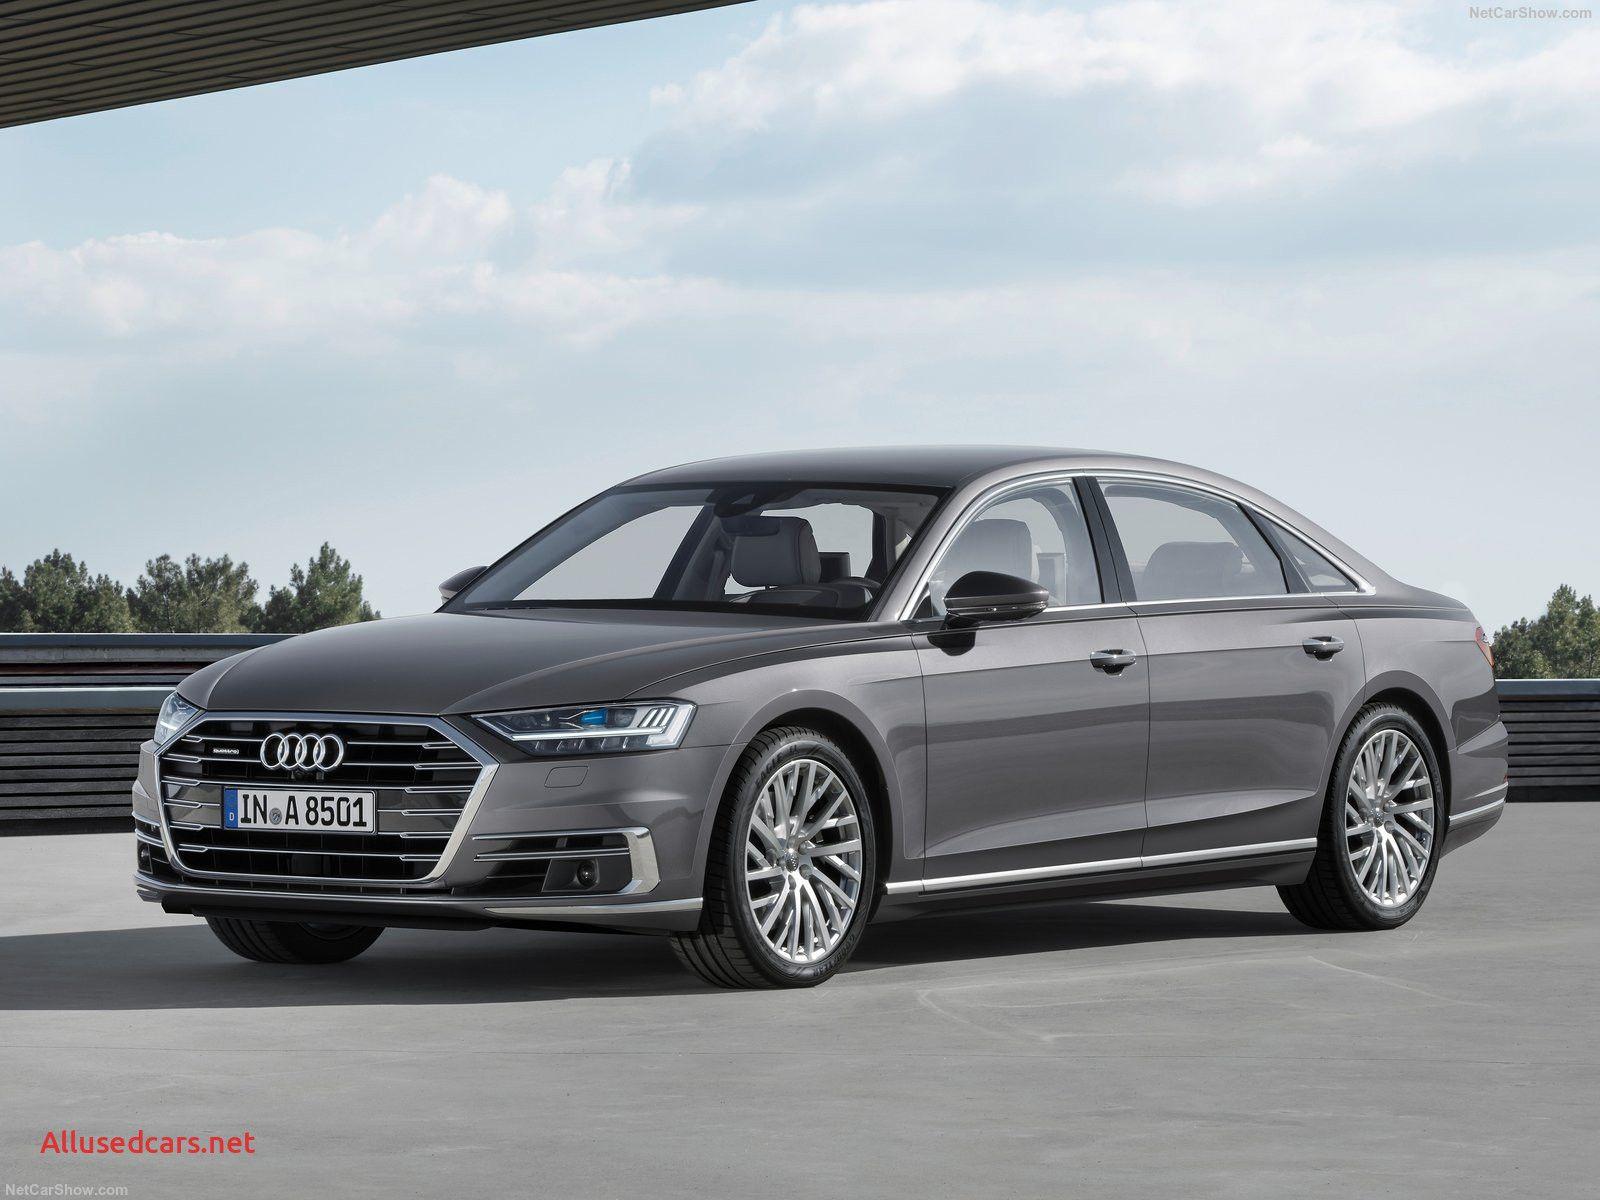 Elegant Audi A8 For Sale In 2020 Audi A8 Audi For Sale Luxury Hybrid Cars